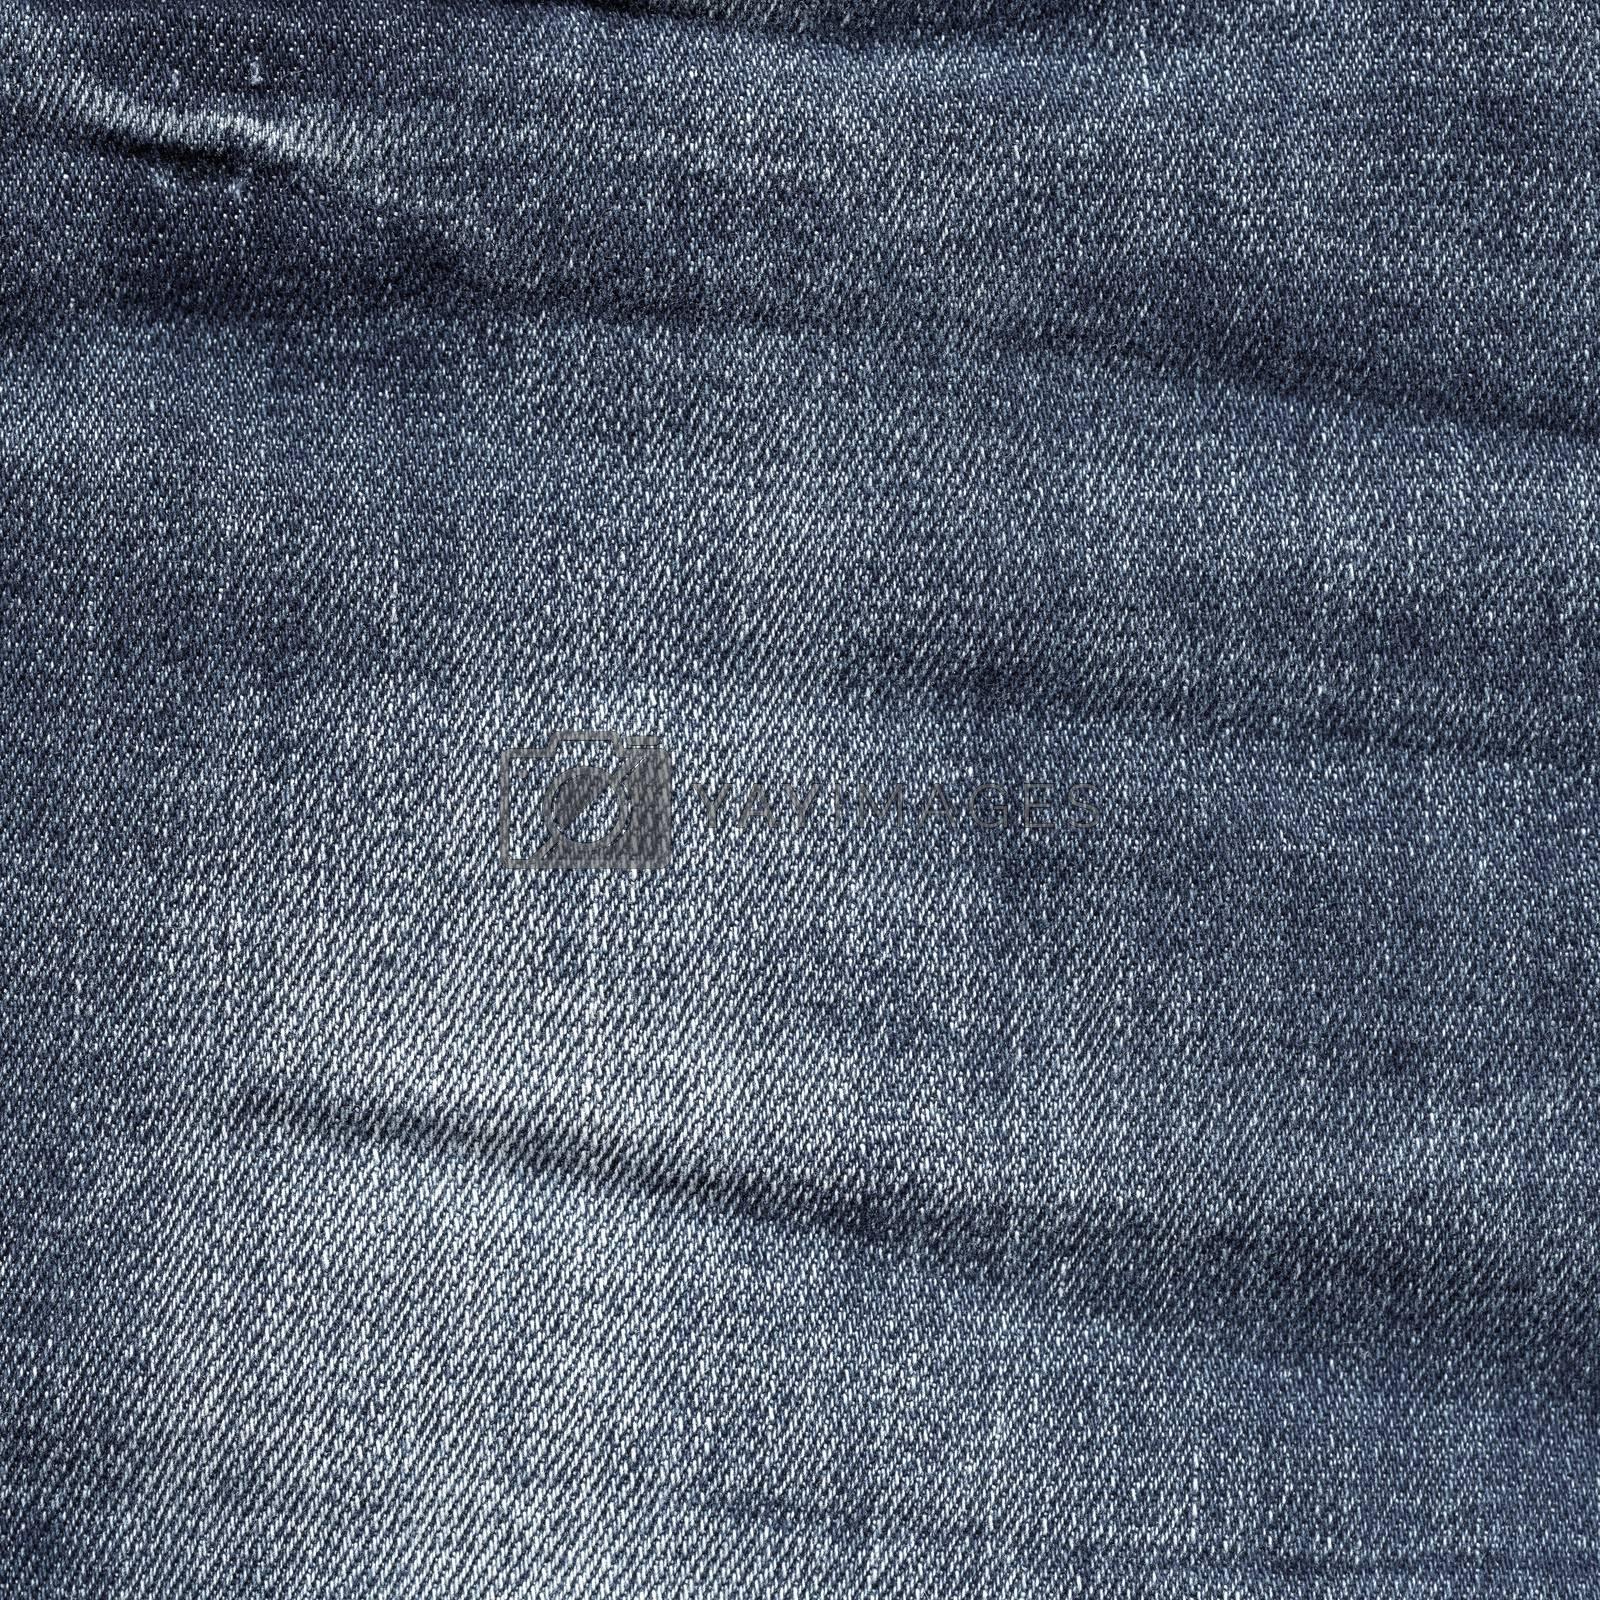 Grey Jeans Denim Crumpled Texture. Fashion modern style